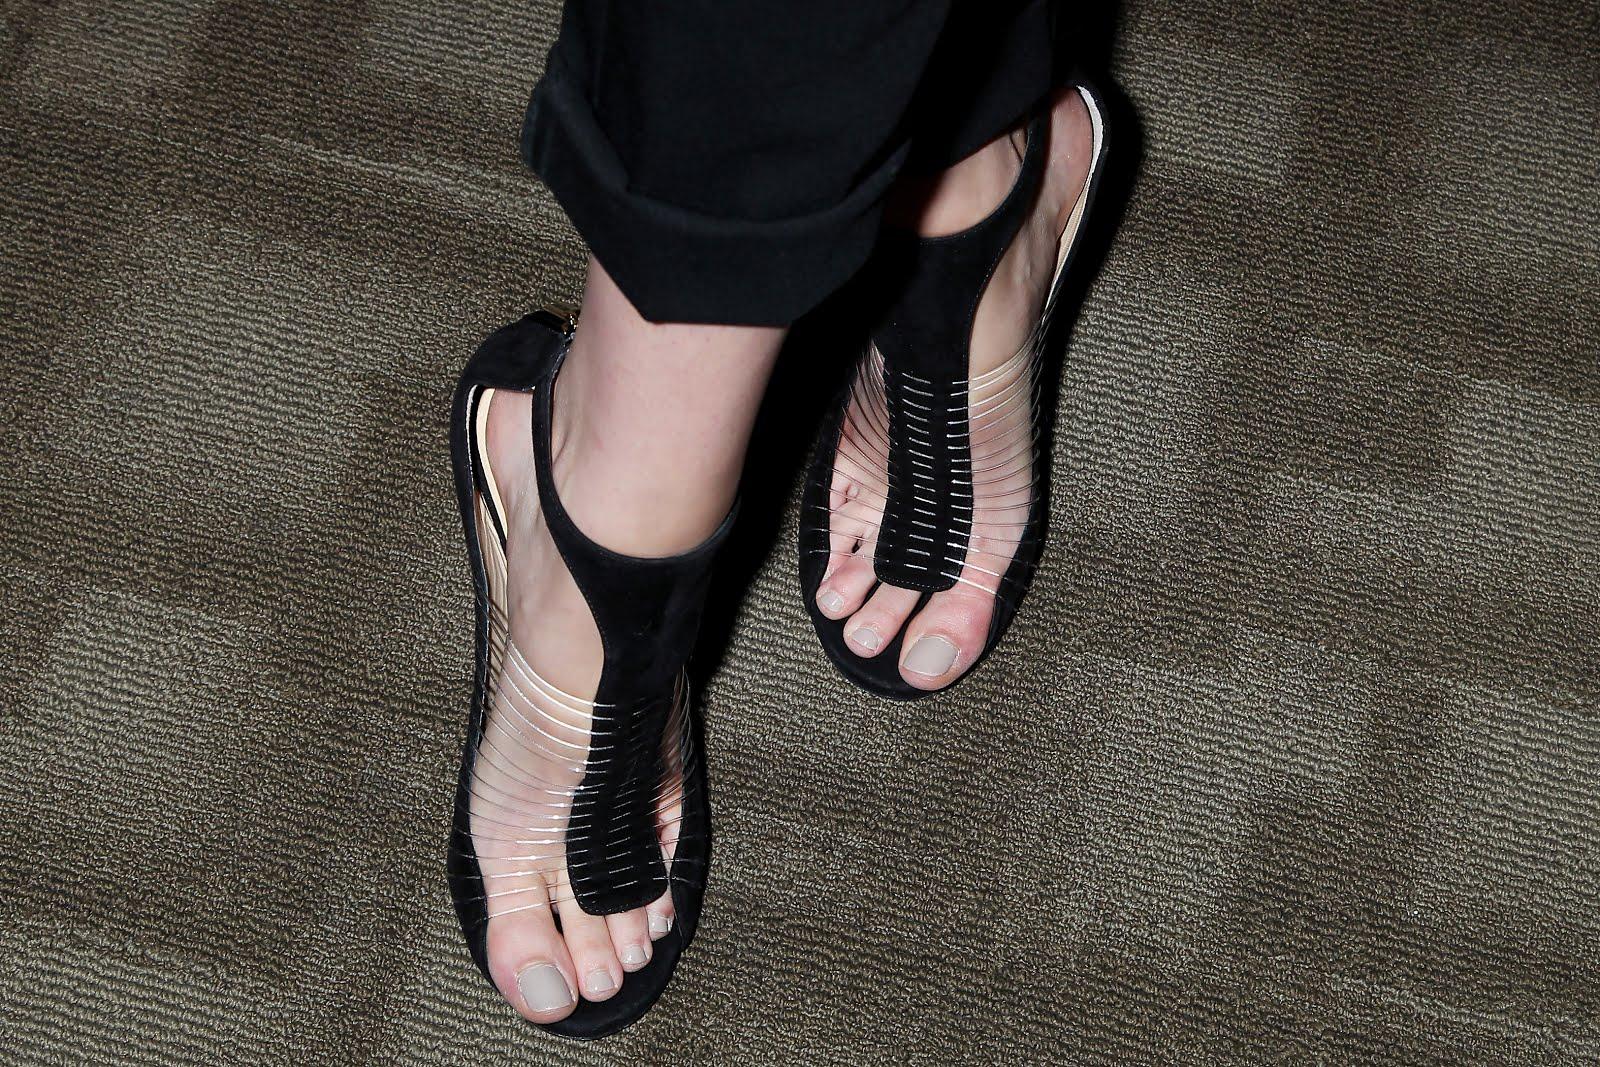 Feet Kristen Stewart nude (87 photo), Tits, Cleavage, Boobs, in bikini 2020